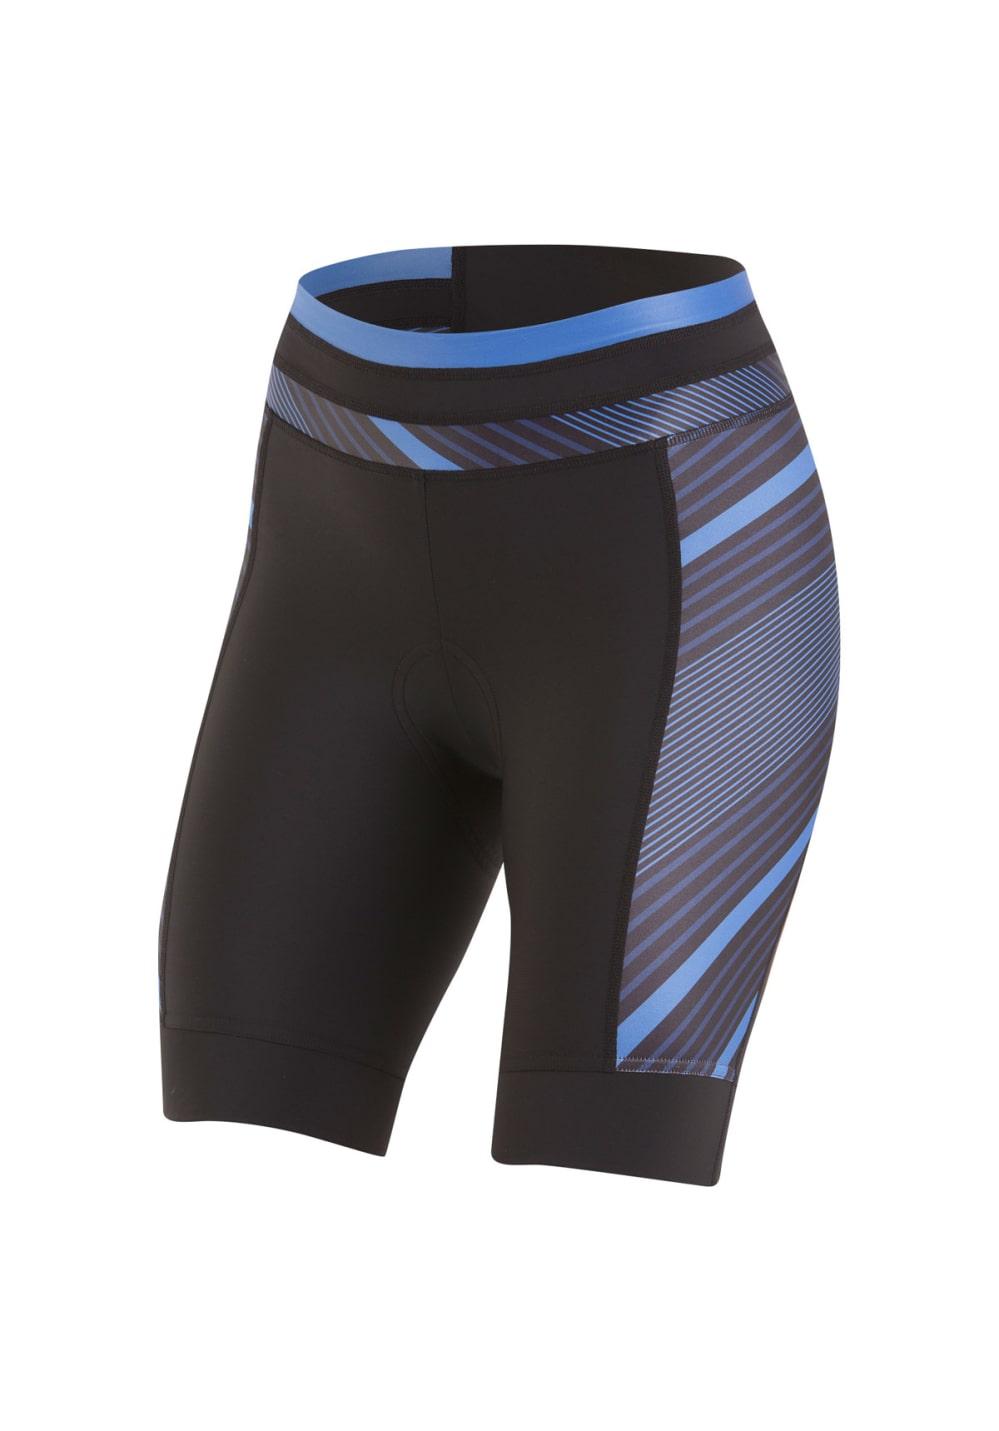 07cc5cffd97f Next. -60%. Pearl Izumi. Elite Pursuit Short - Cycling shorts for Women